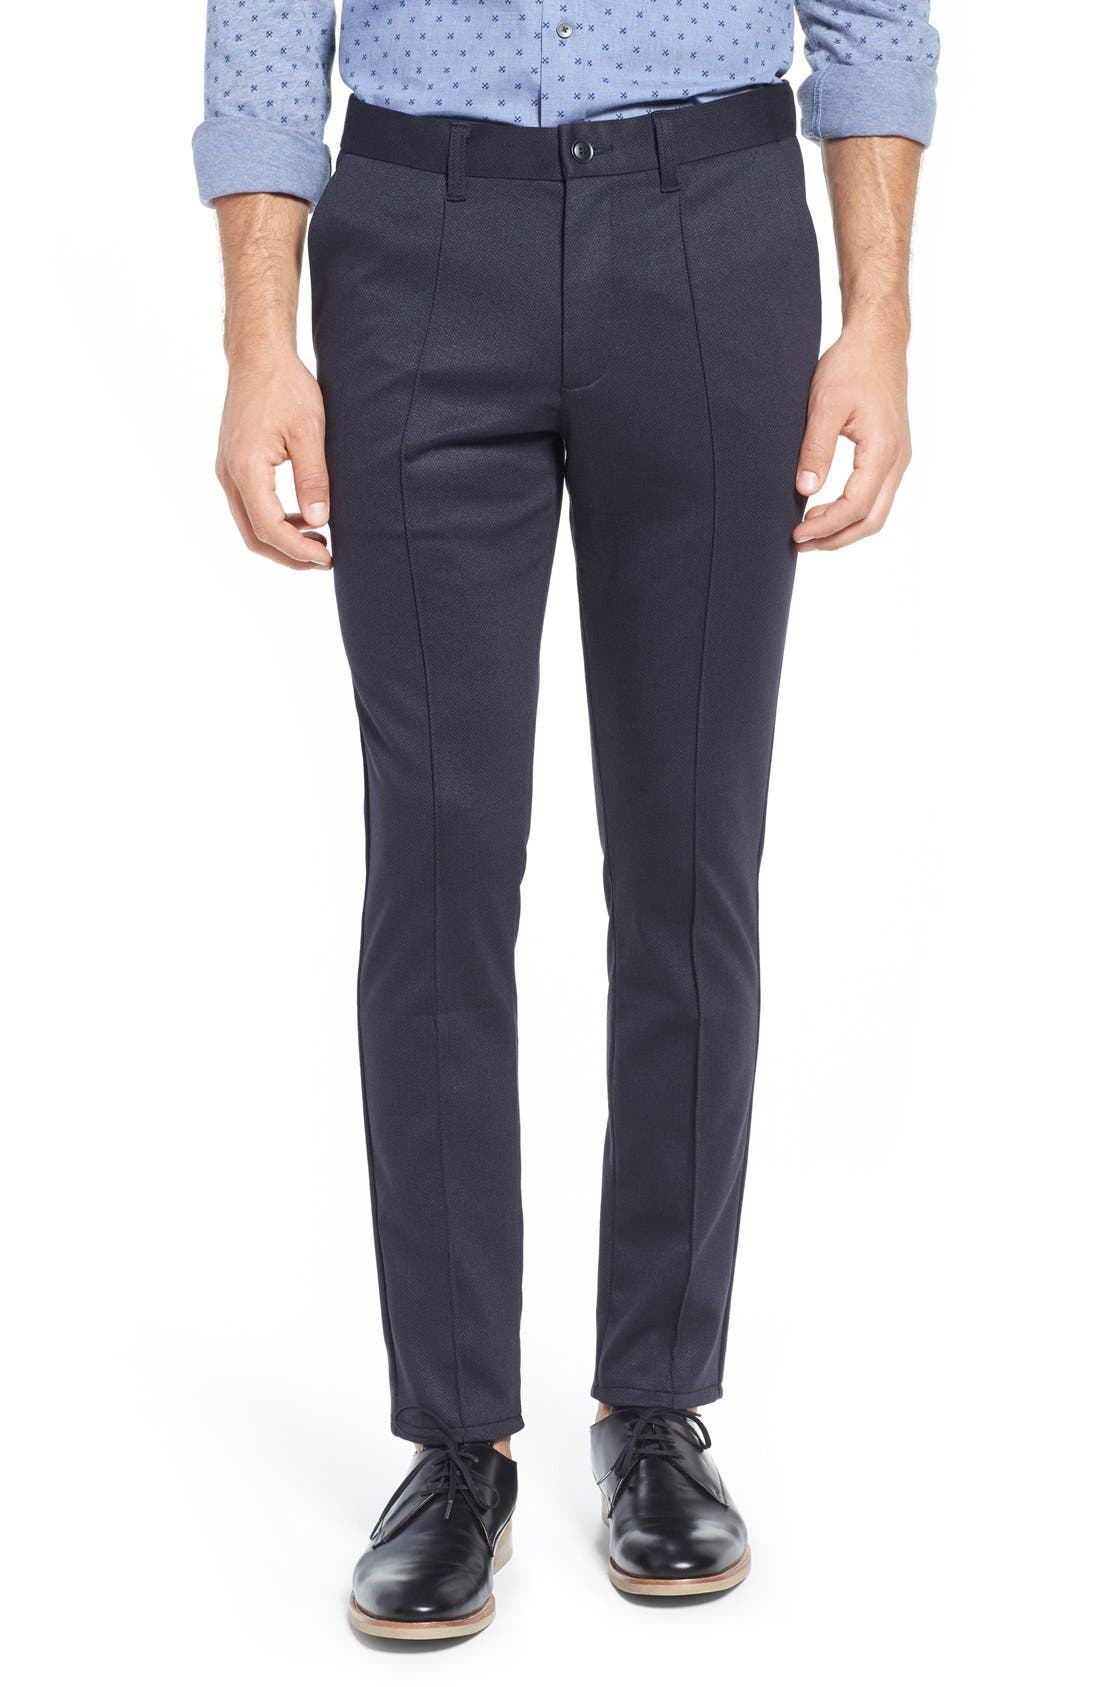 Prospect Herringbone Slim Fit Trousers,                             Alternate thumbnail 3, color,                             001